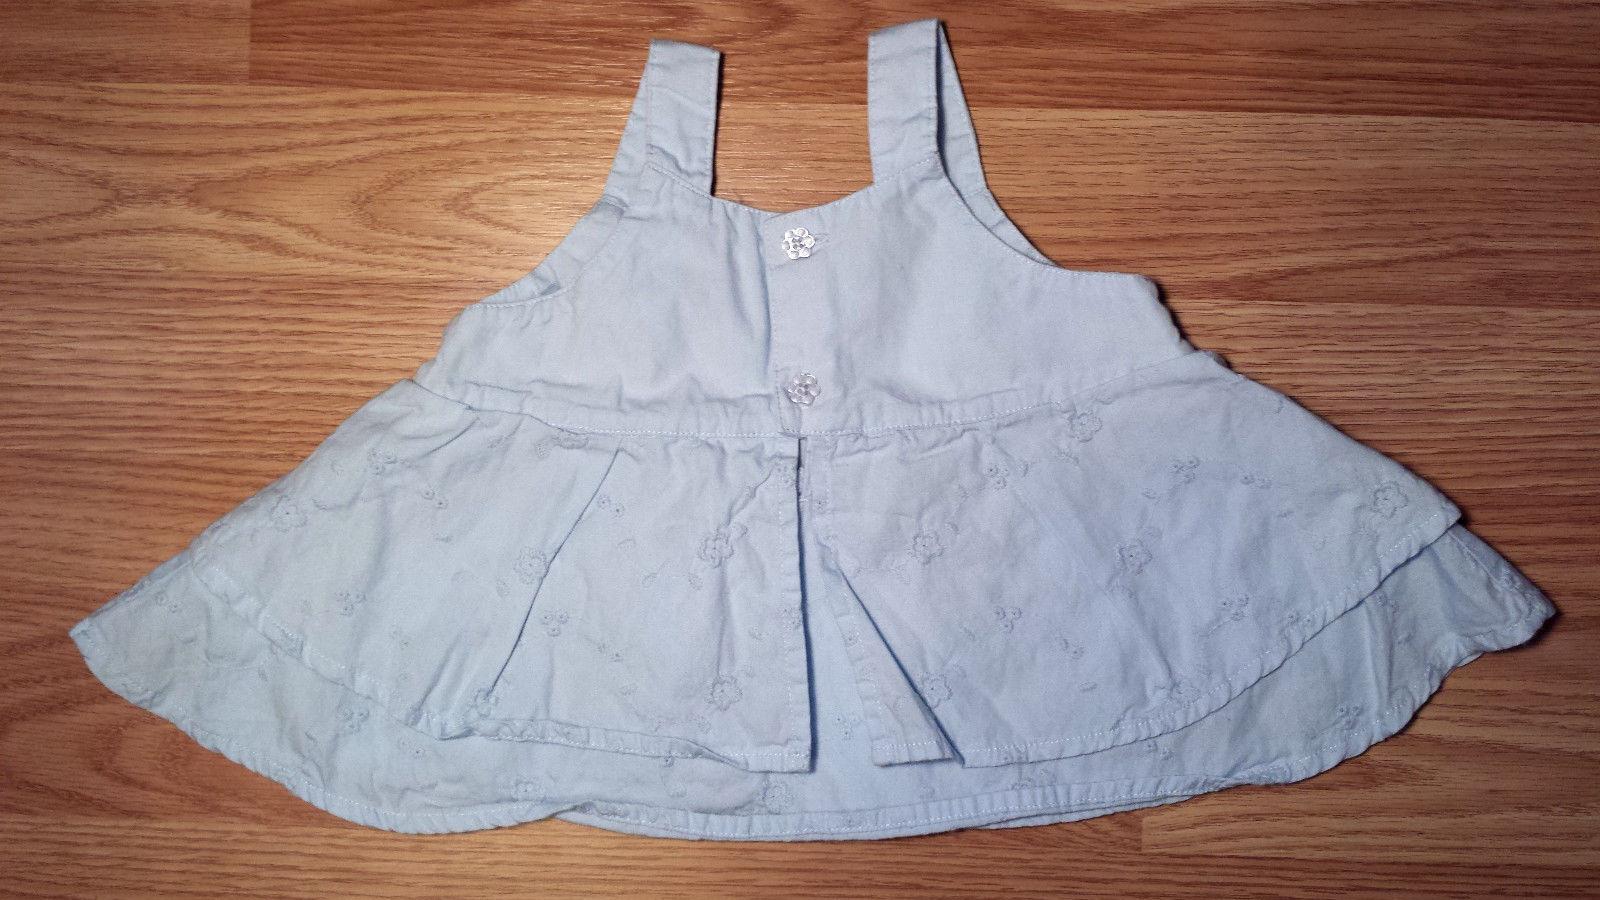 Girl's Size 6 M Months 2 Pc Blue Floral Eyelet Embroid Carter's Dress, Satin DC